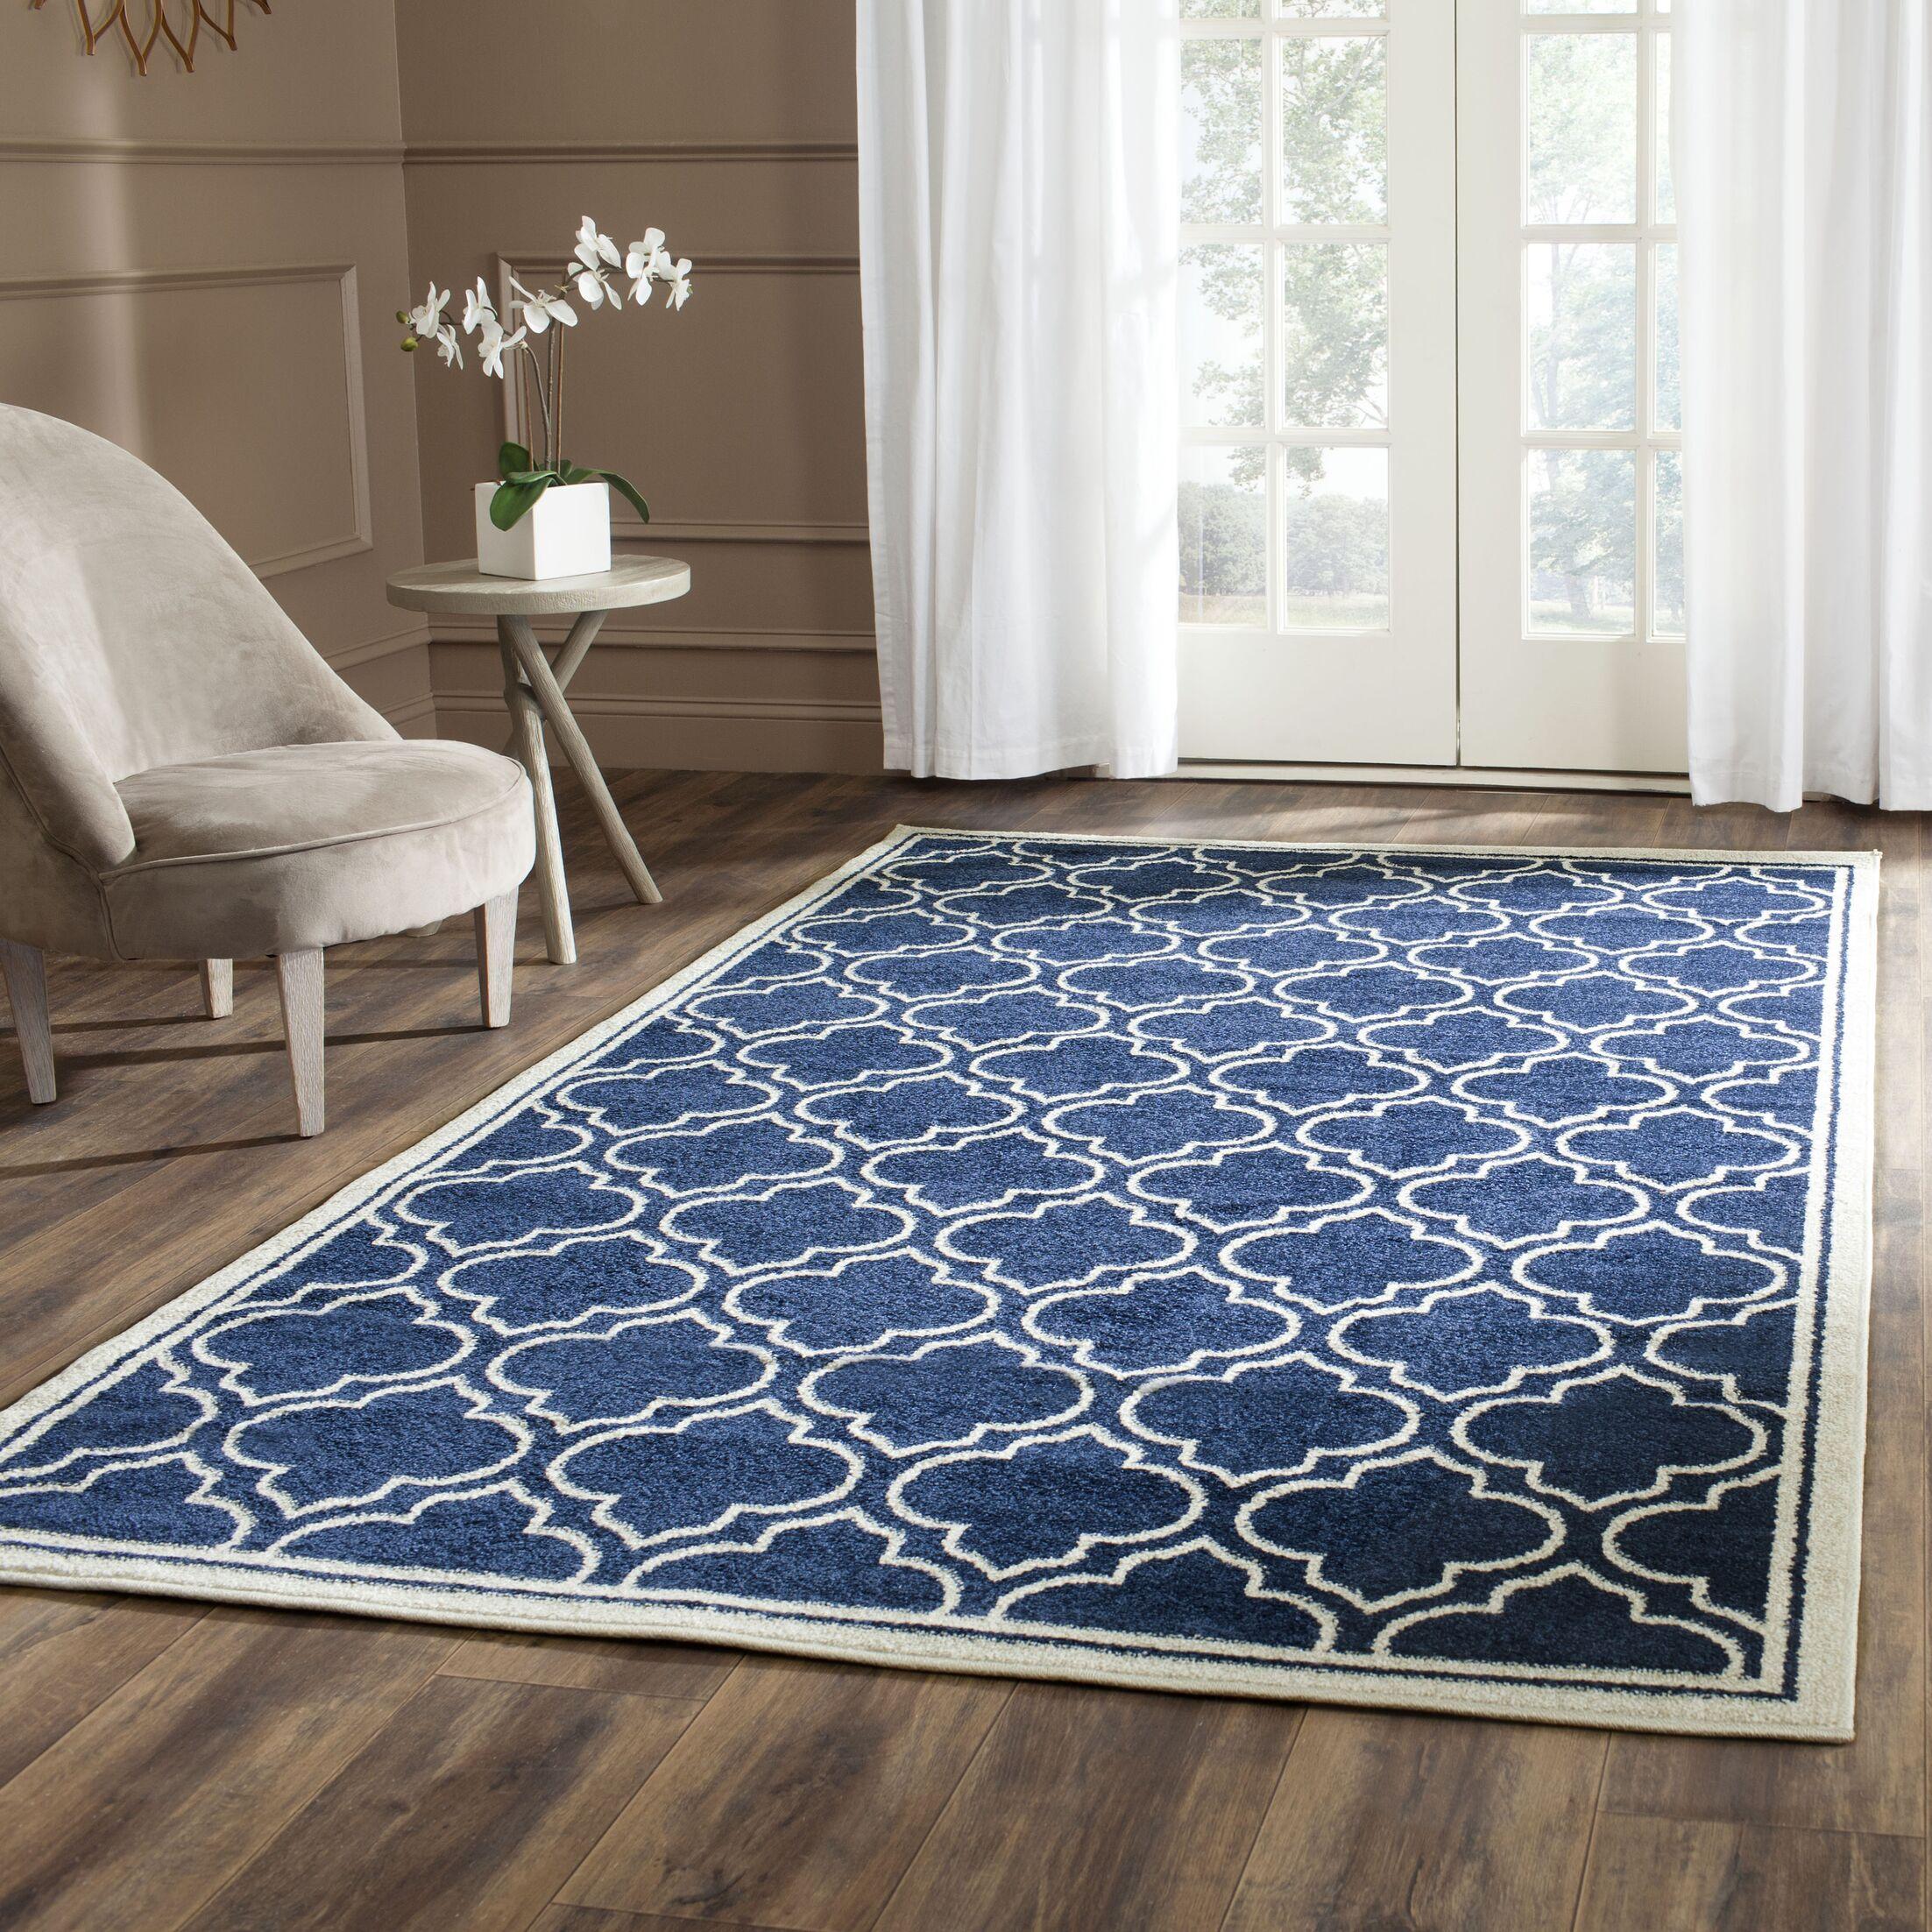 Maritza Navy / Ivory Indoor/Outdoor Area Rug Rug Size: Rectangle 4' x 6'